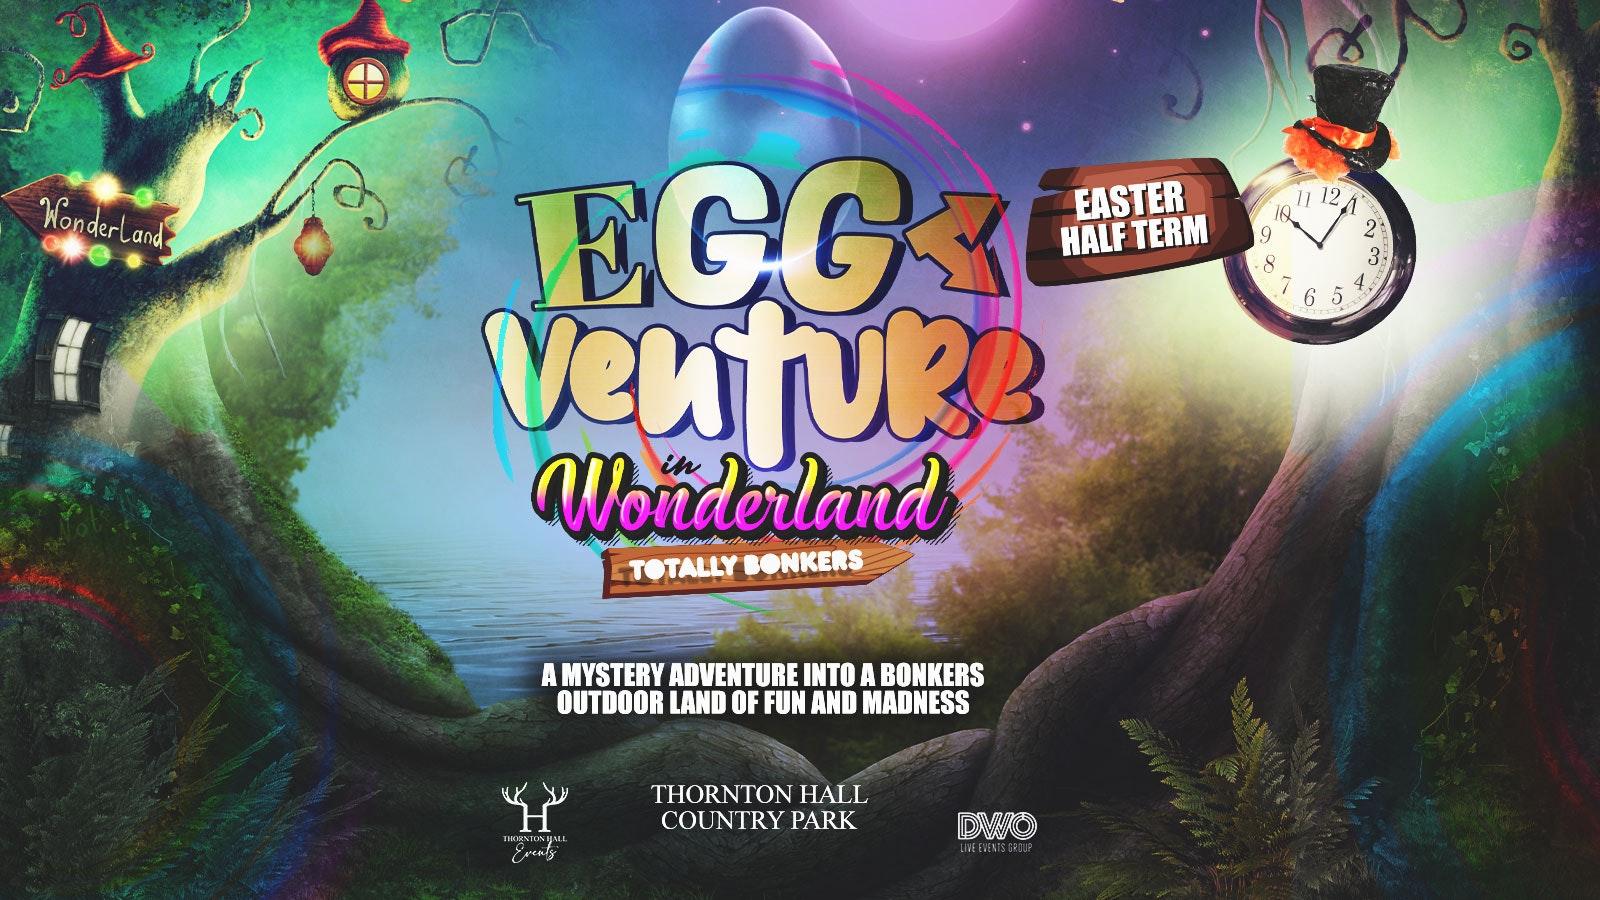 EggVenture in Wonderland – Sunday 11th April – 12noon